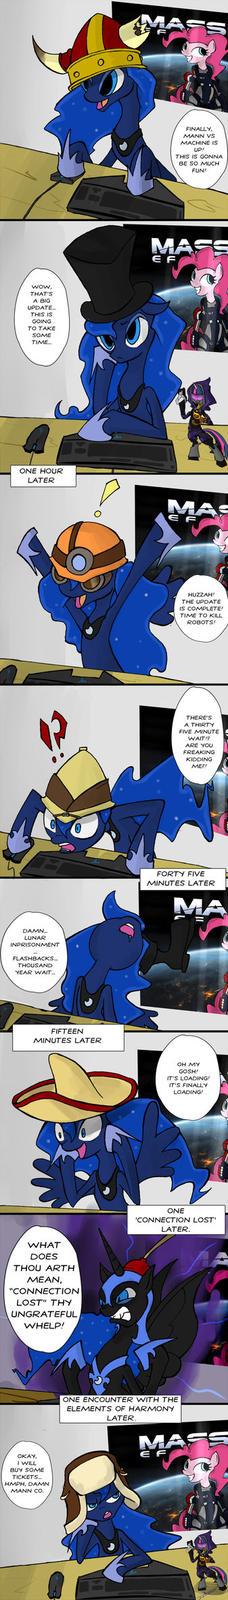 Luna and Man vs Machine